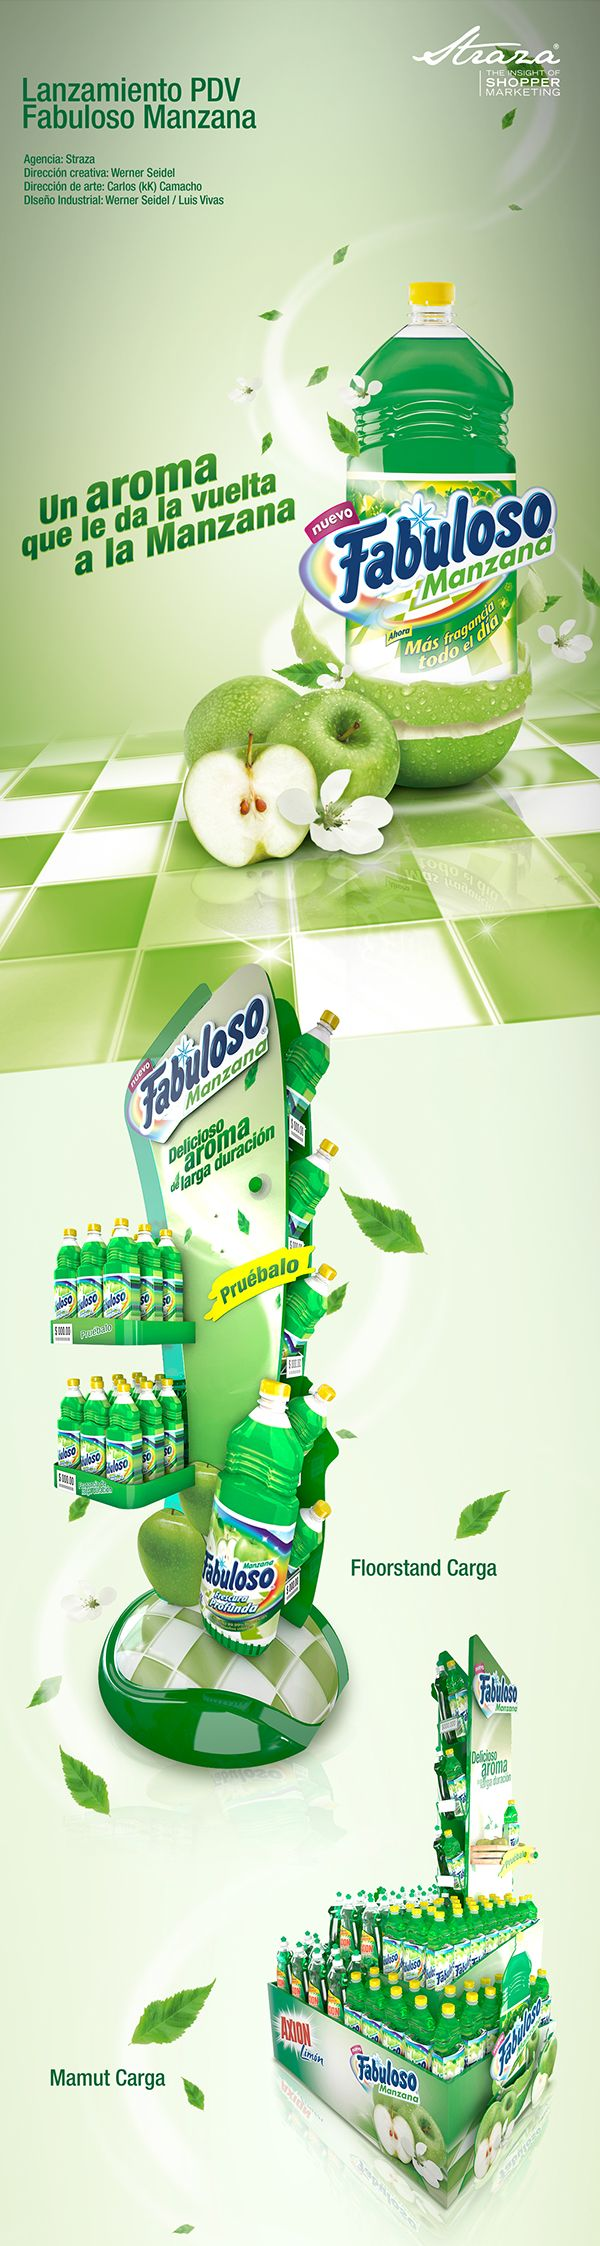 Fabuloso Manzana on Behance